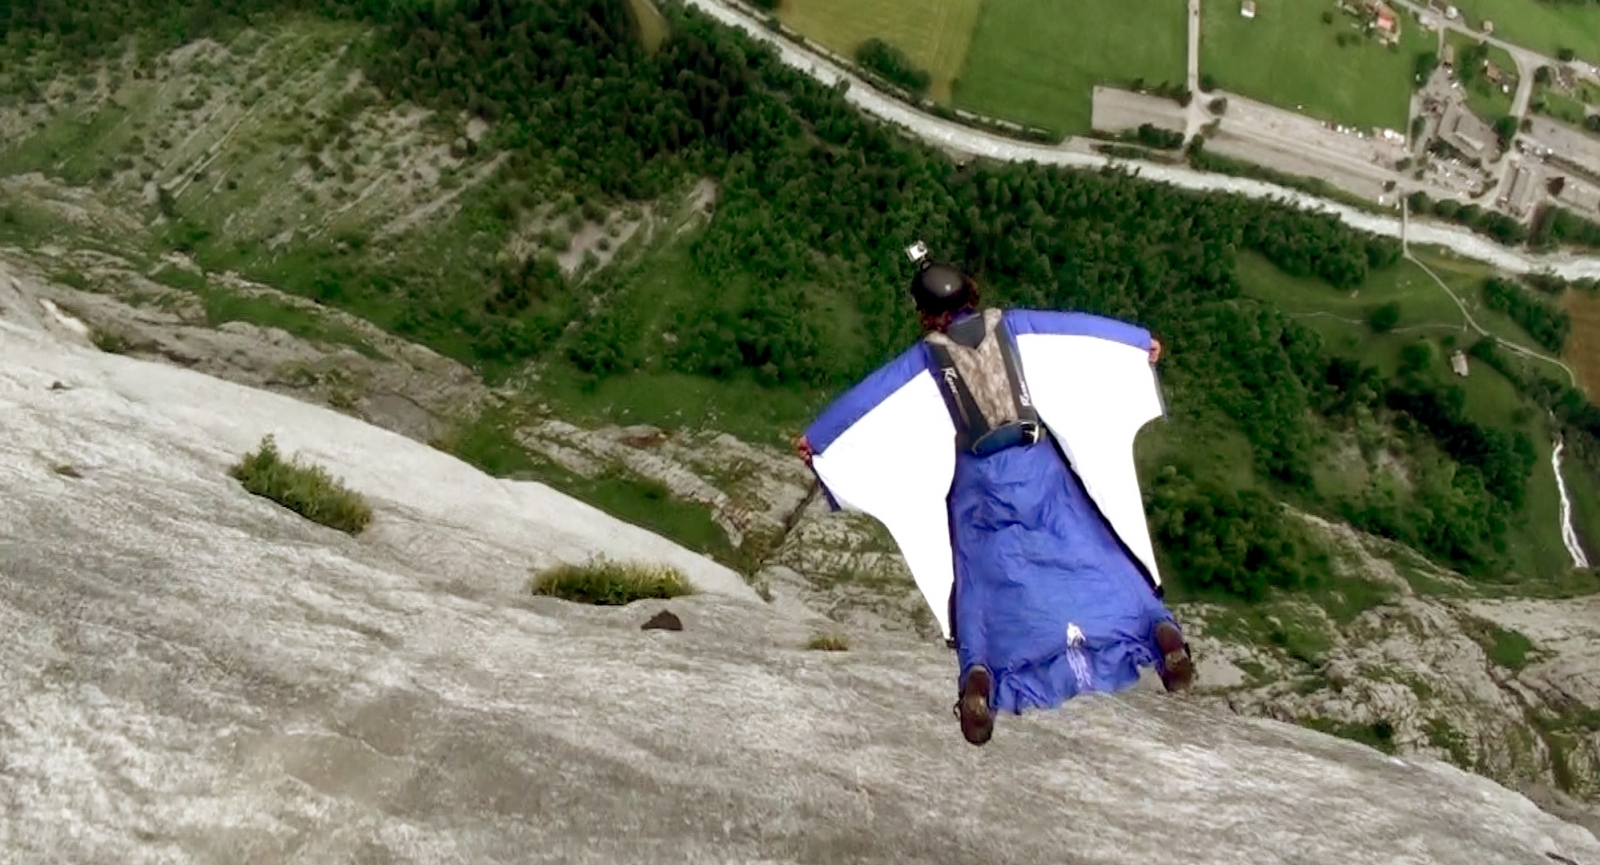 Alexander Polli base jumping in Lauterbrunnen, Switzerland